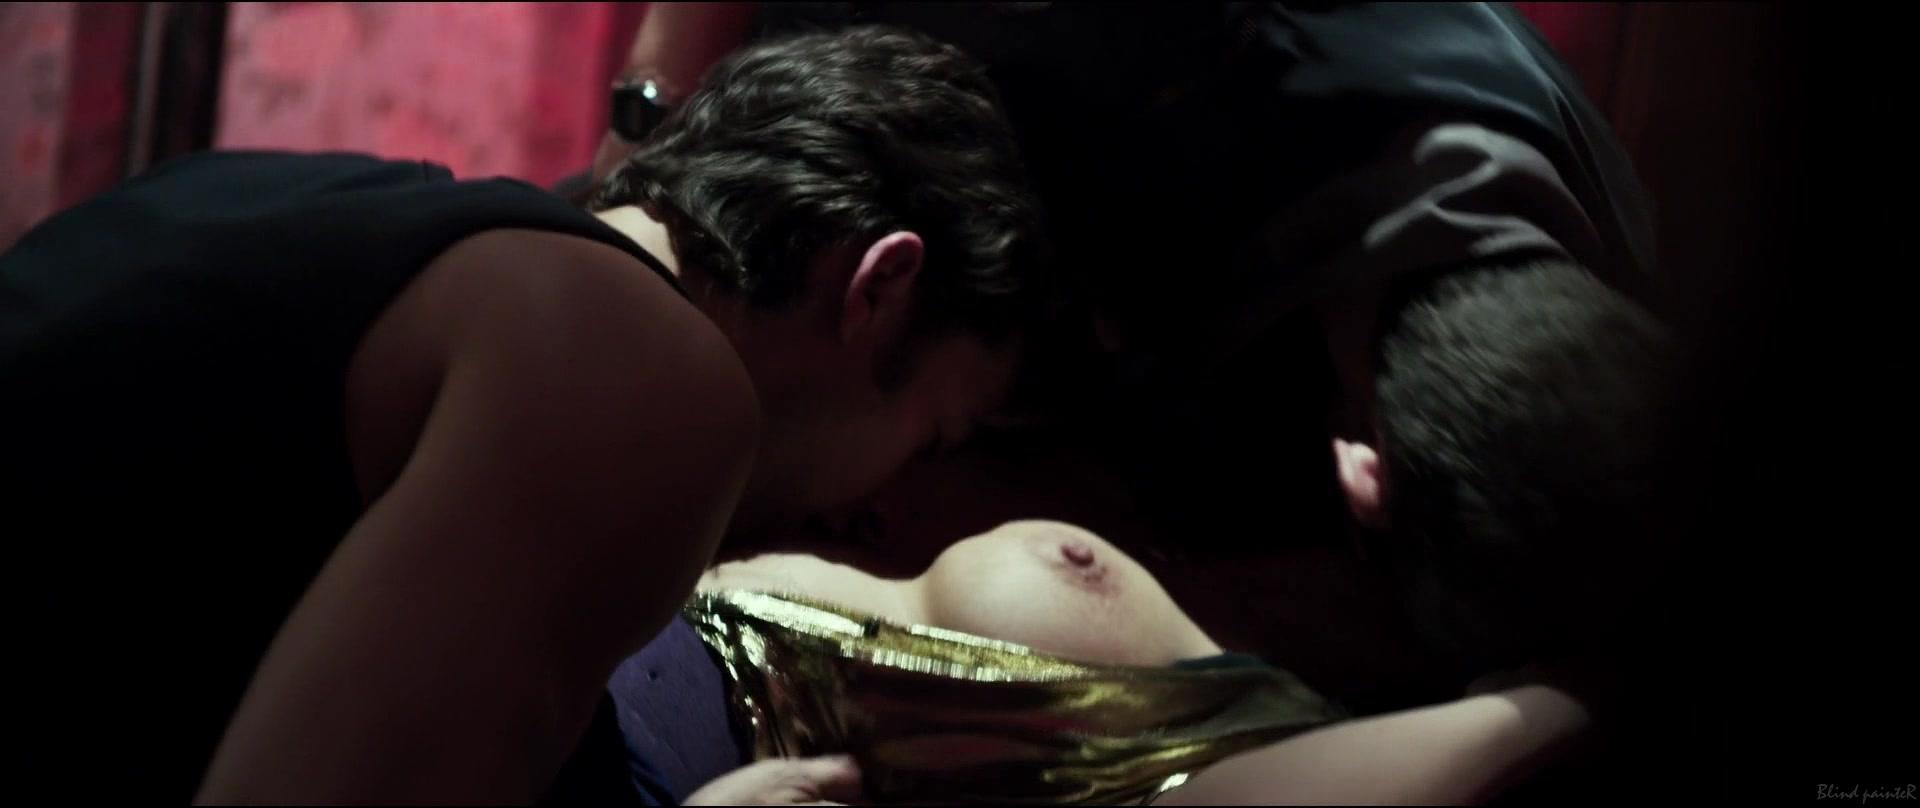 America Olivo Video Porno america olivo nude - maniac (2012) video � best sexy scene